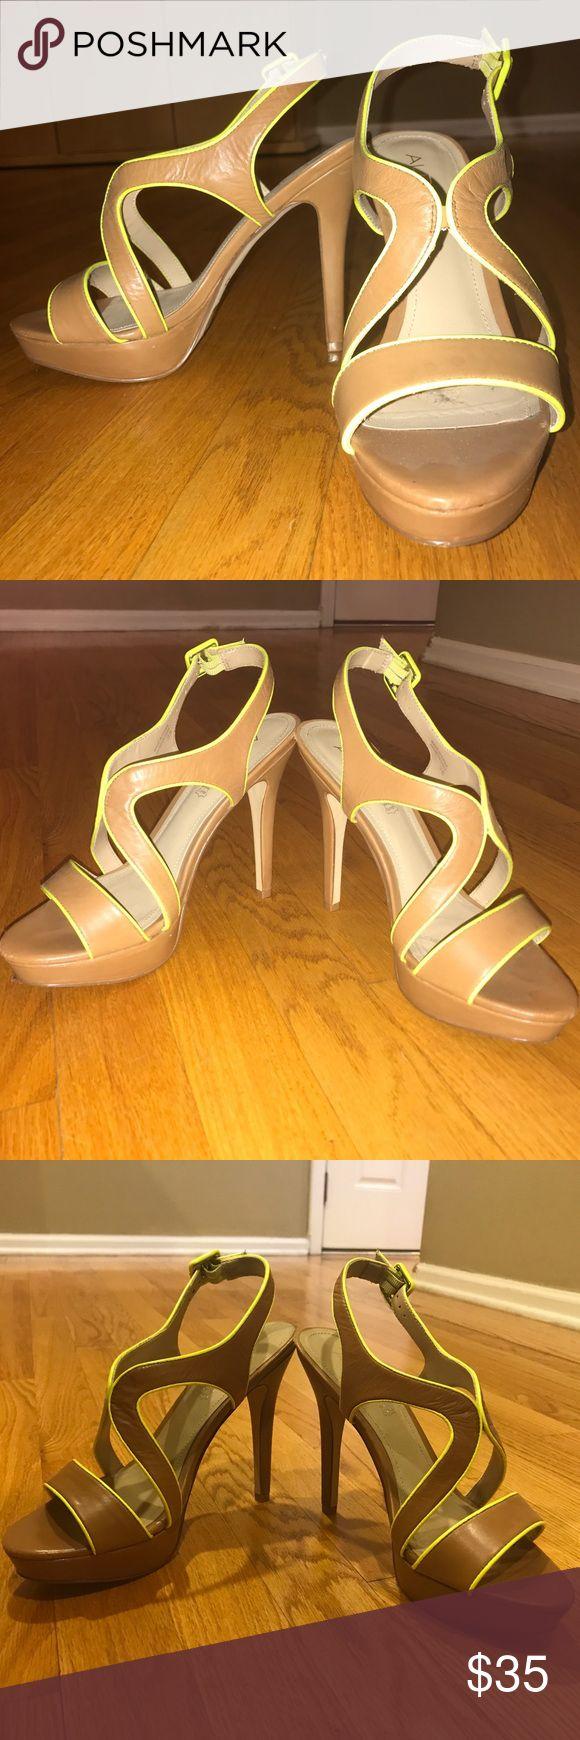 ALDO Bracker Heeled Sandal Size 38 ALDO Bracker Heels. Camel color with neon yellow trim. Size 38. Worn several times but still has tag under shoe. Aldo Shoes Sandals